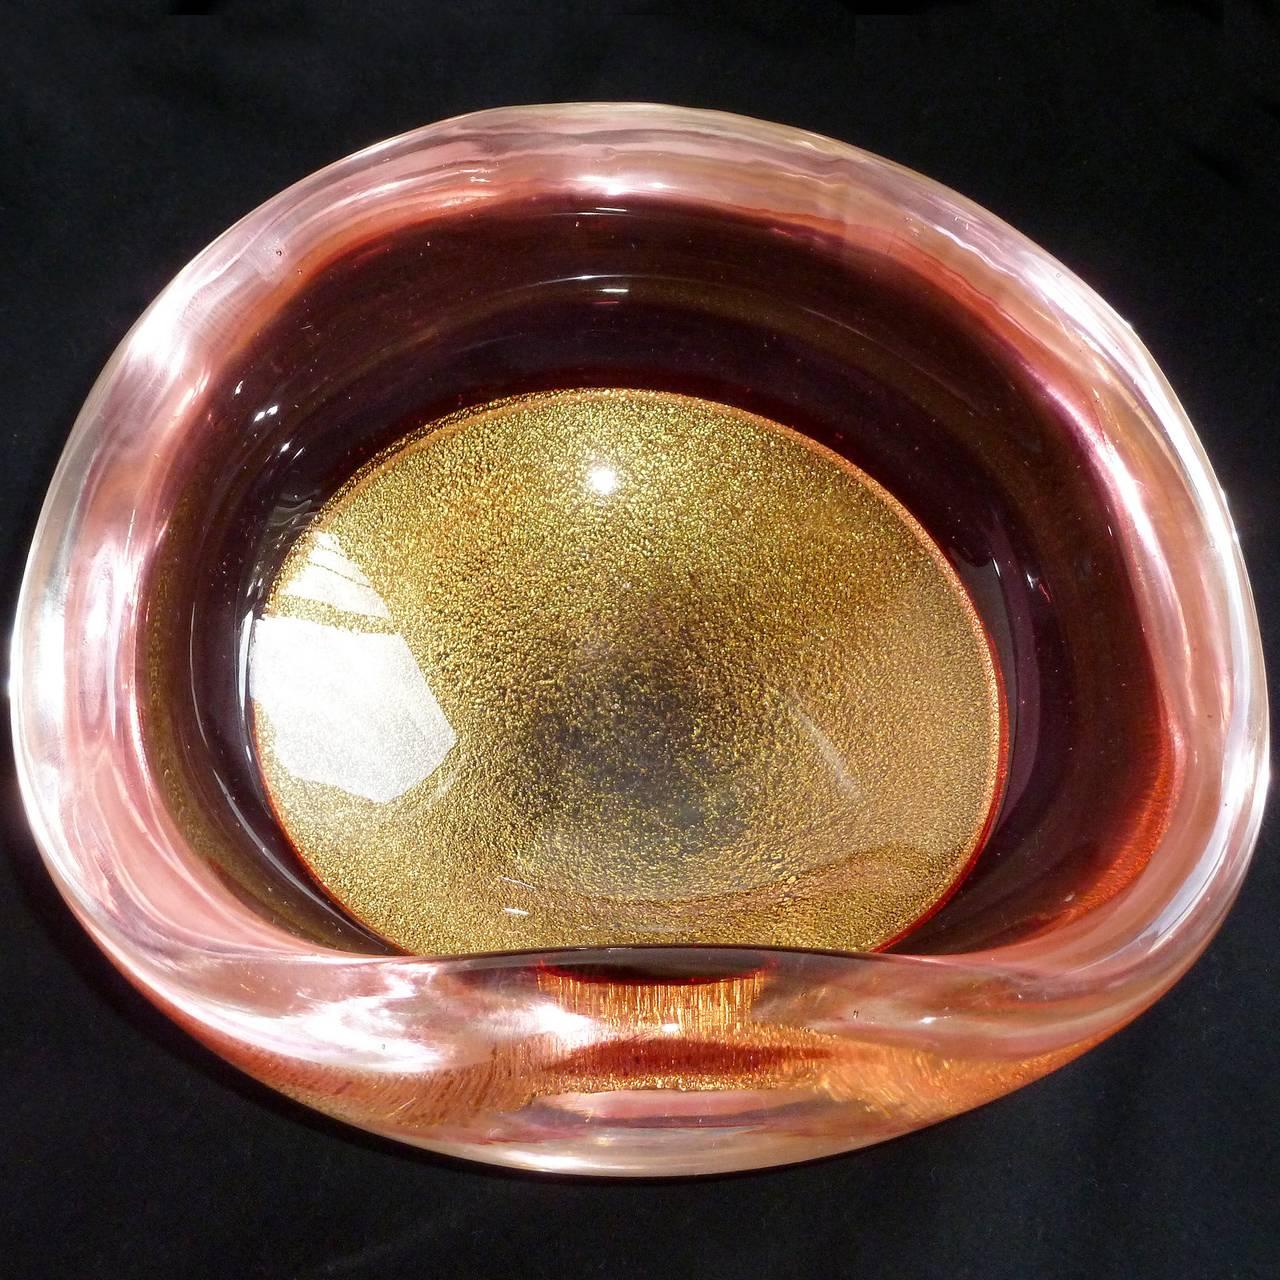 Mid-20th Century Archimede Seguso Murano Gold Flecks Pink Incalmo Rim Italian Art Glass Bowl For Sale